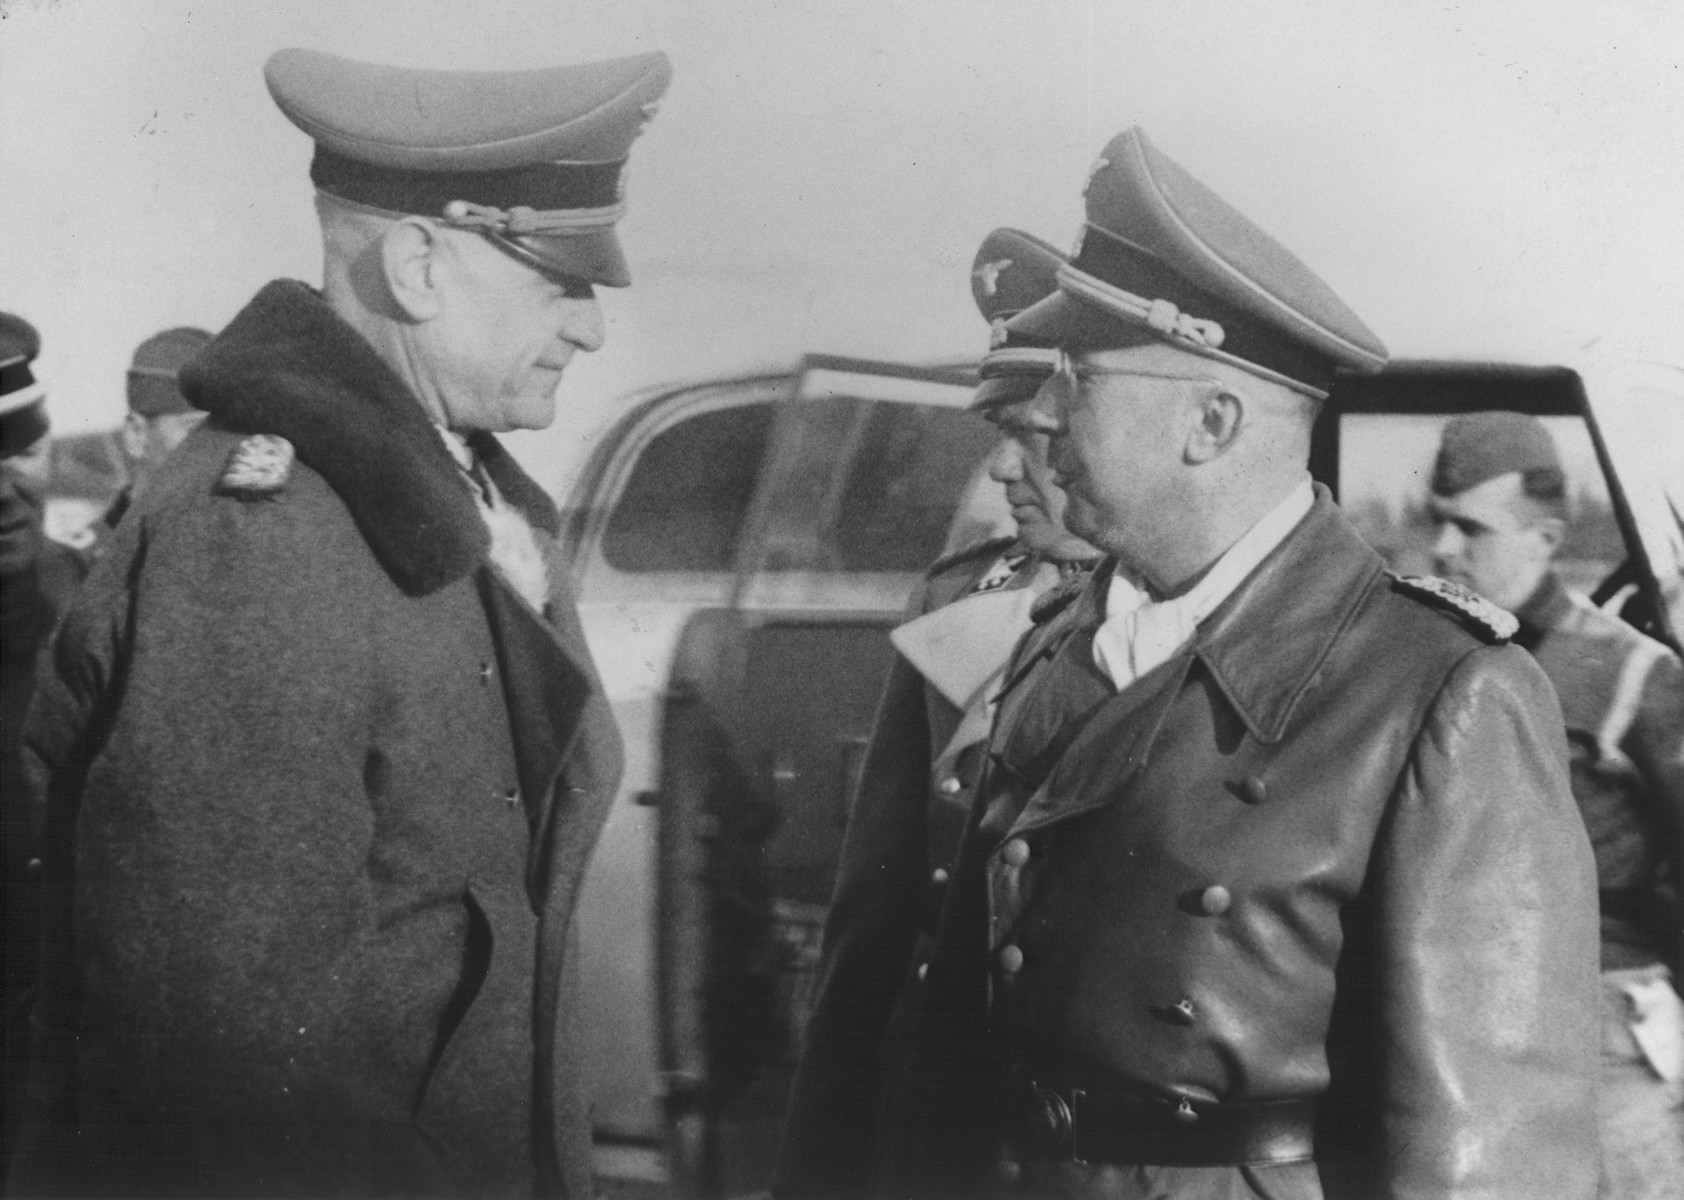 Reichsfuehrer-SS Heinrich Himmler converses with SS-Obergruppen Fuehrer Alfred Wunnenberg.  Pictured to Himmler's immediate right Friedrich Jeckeln.